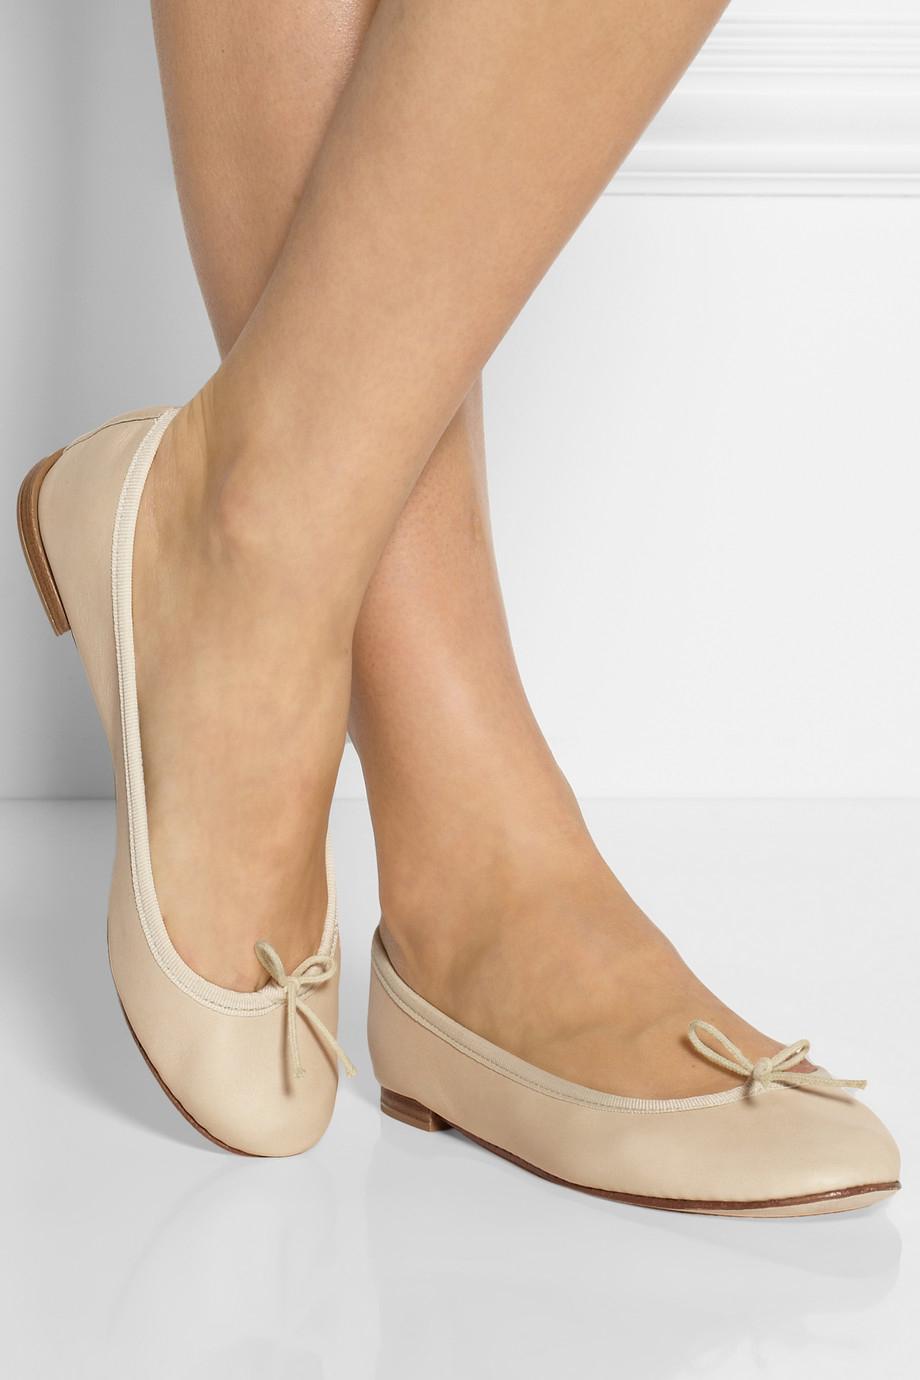 Repetto Metallic Cendrillon Ballerina Flats Latest Sale Online Buy Cheap Exclusive Buy Cheap Professional For Nice ZzKkW